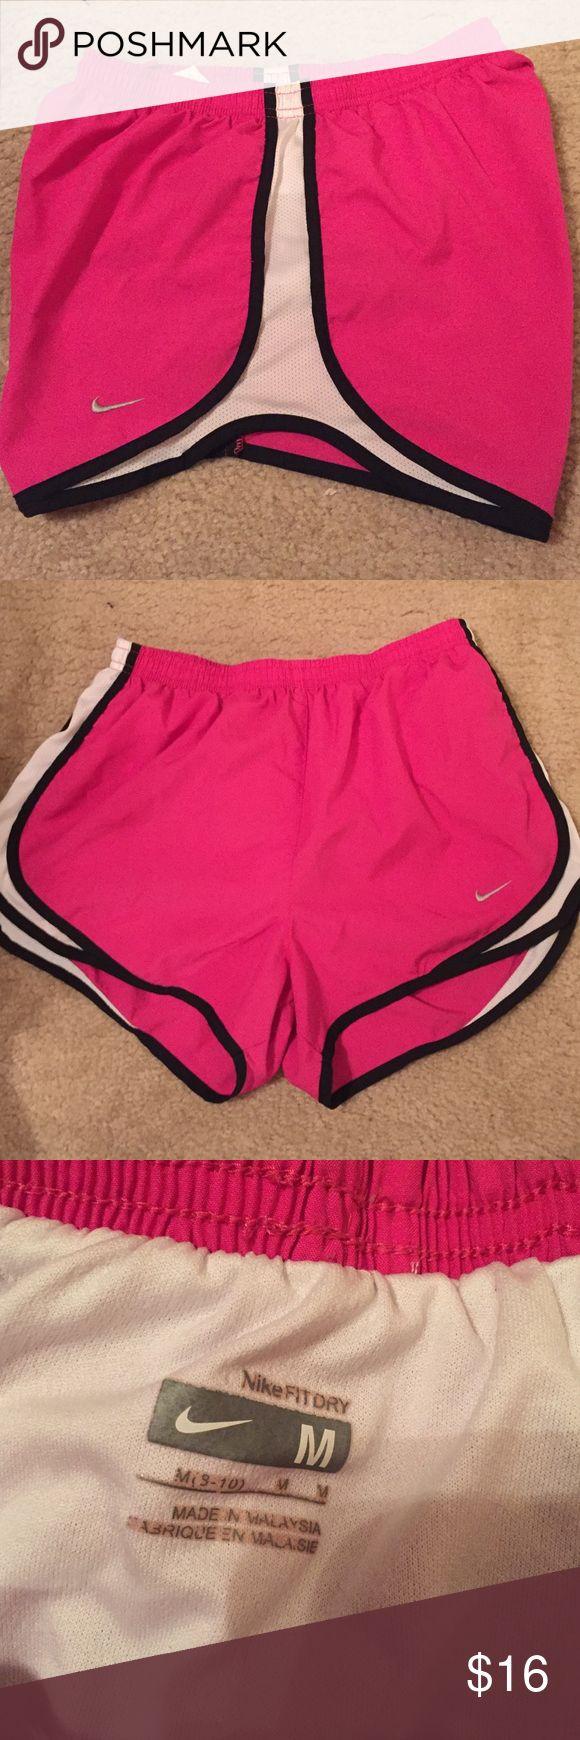 Nike women's running shorts size medium Nike women's running shorts size medium. Hot pink with black and white detail. Good condition! Nike Shorts